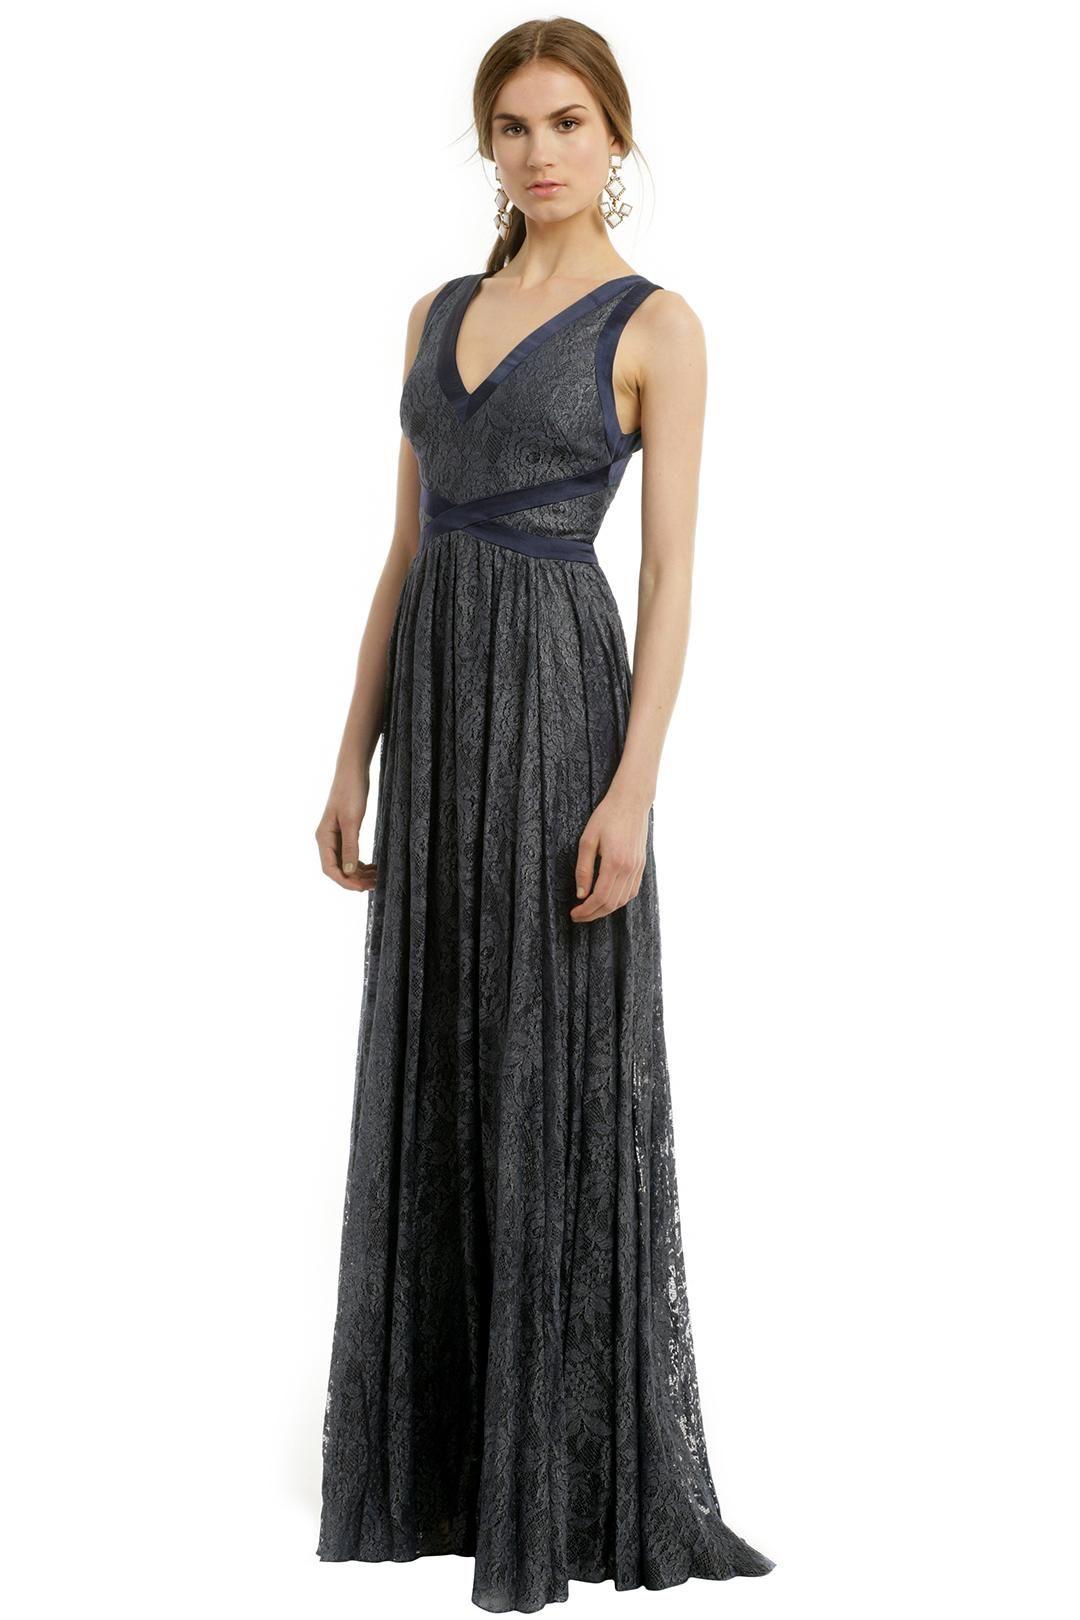 Badgley Mischka Set The Tone Gown | Suit and Tie | Pinterest ...